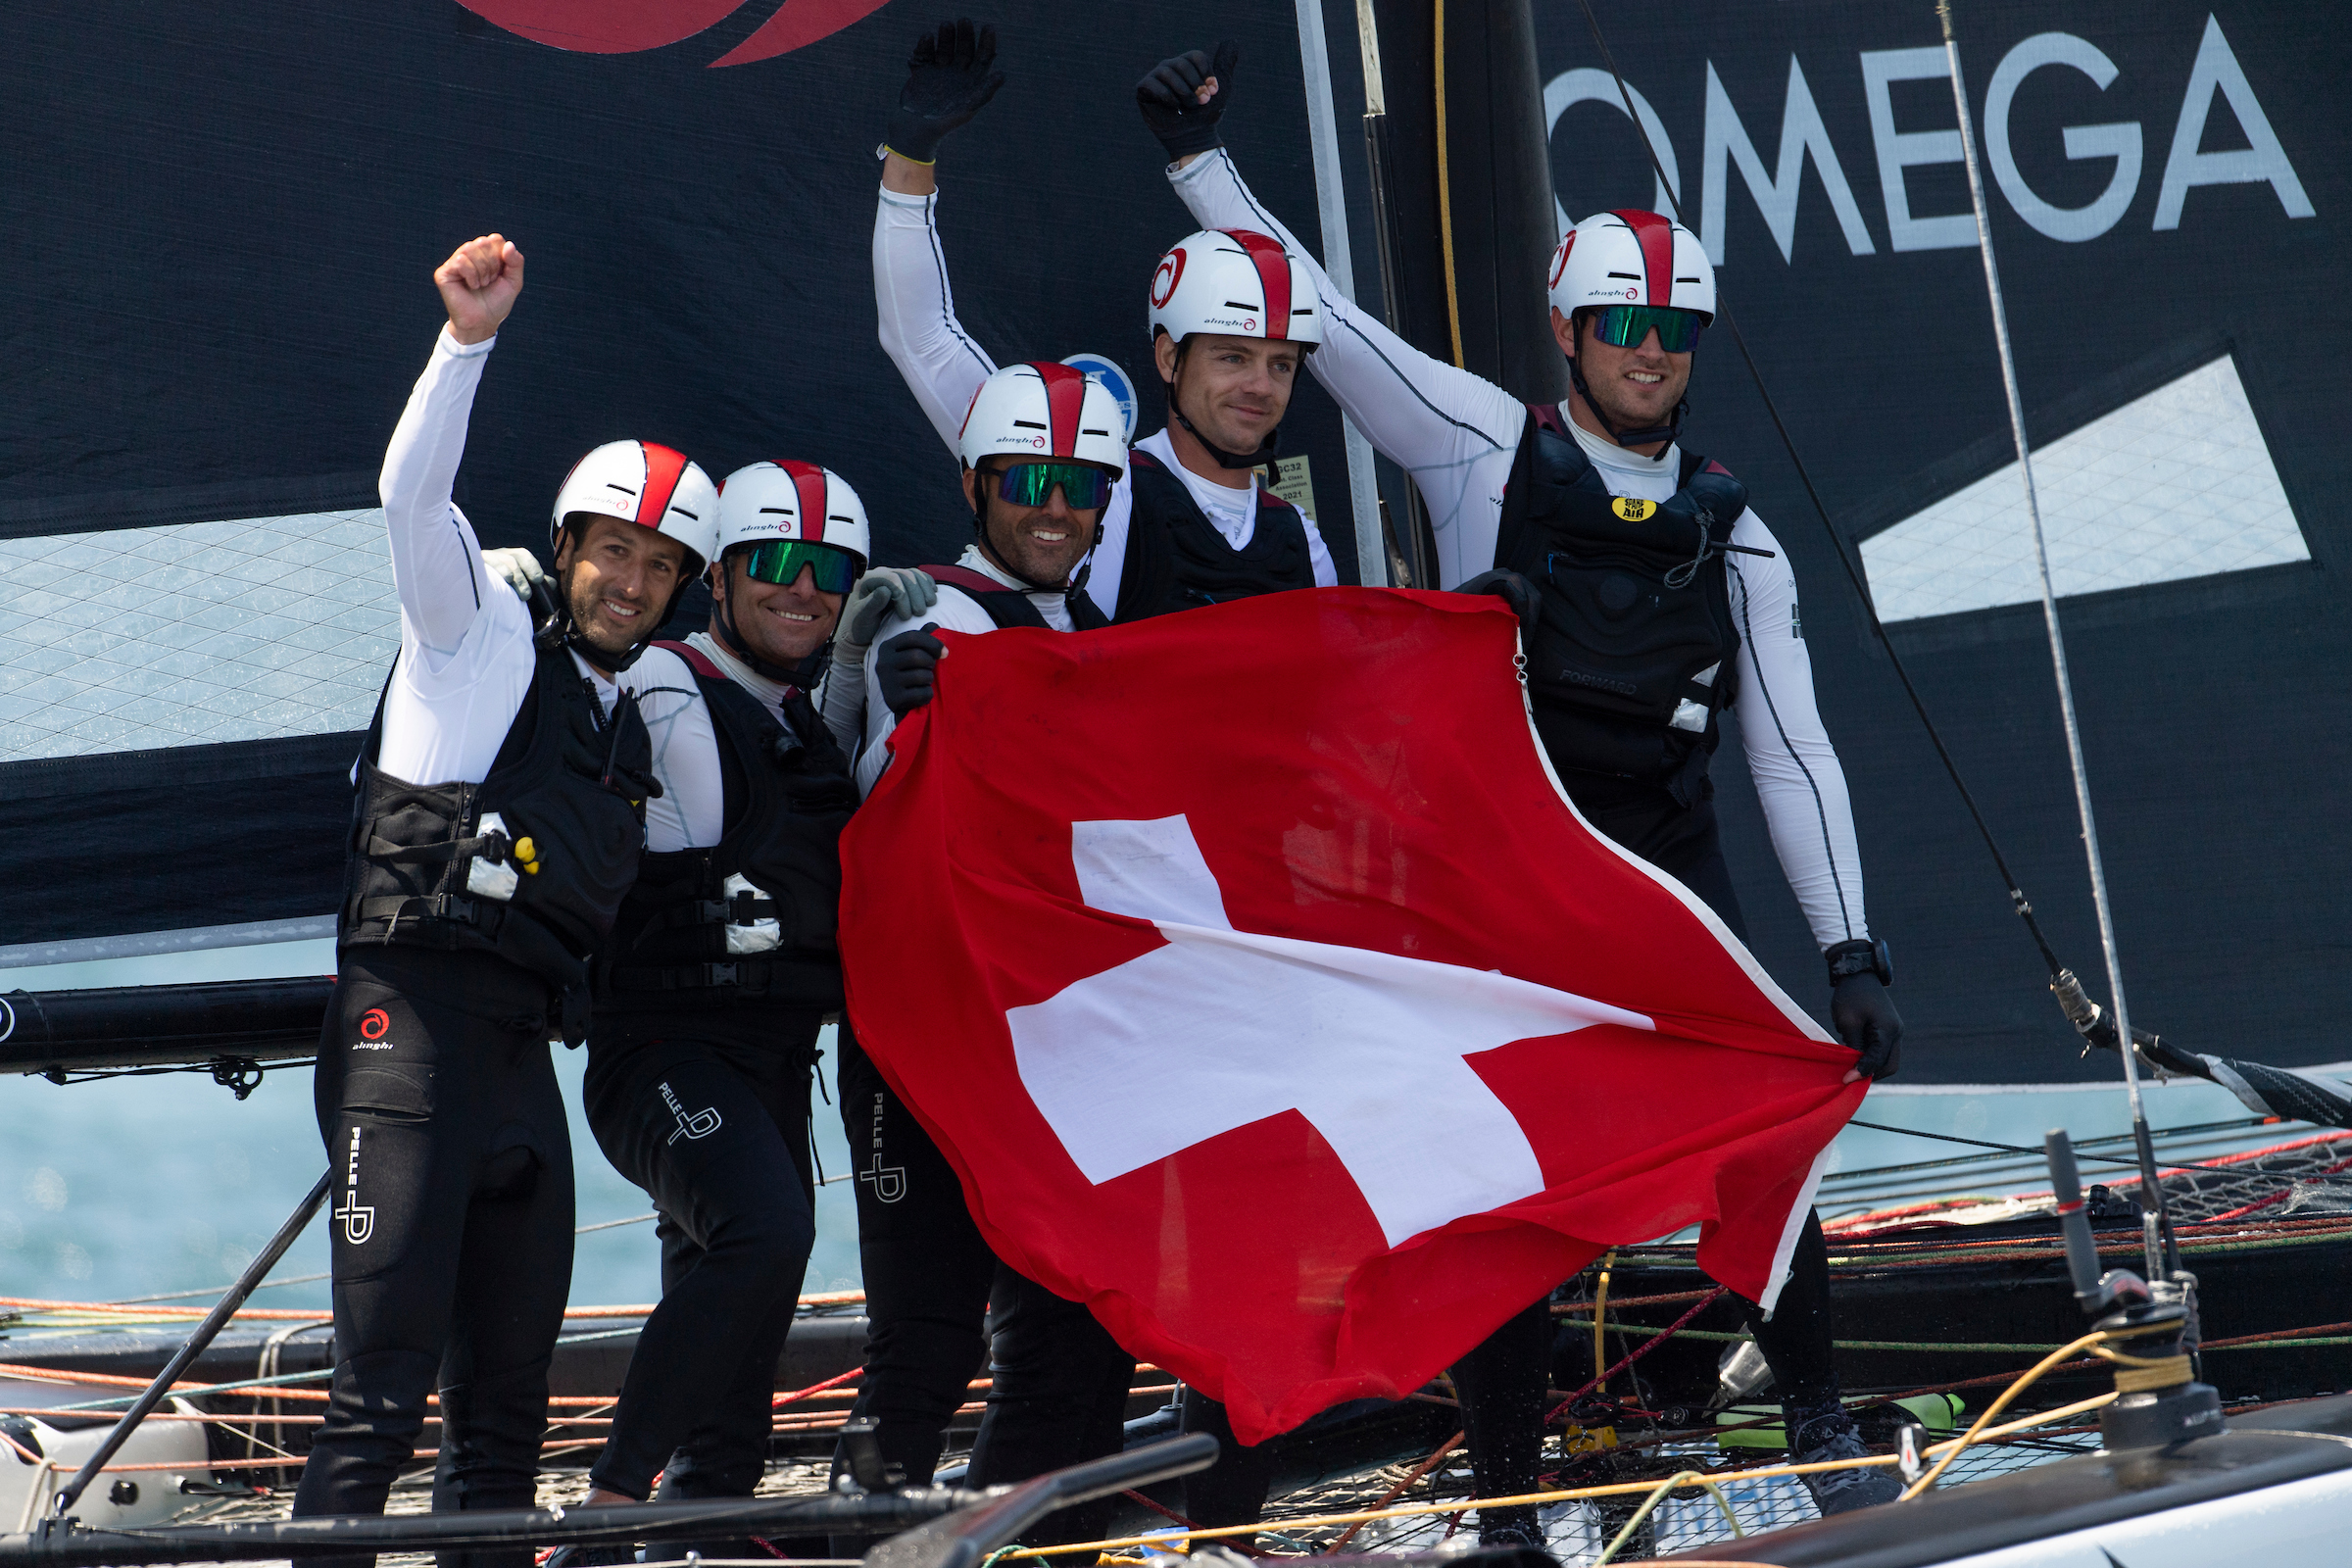 Ernesto Bertarelli's Alinghi team celebrate their win